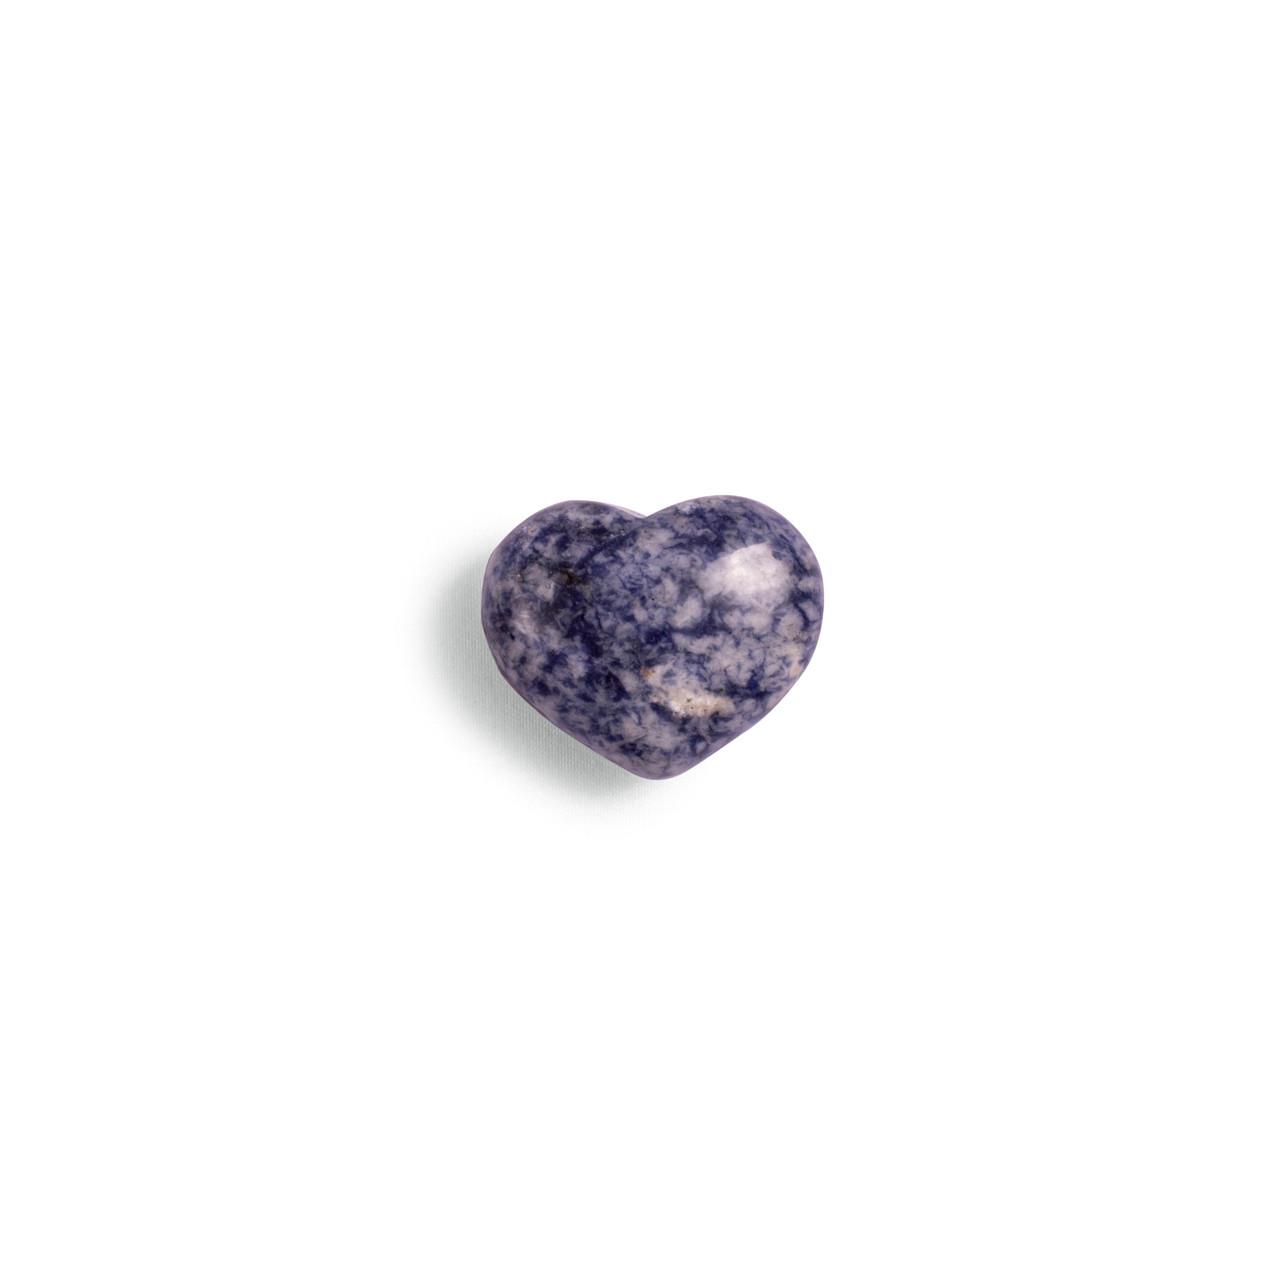 Sodalite Mini Heart Shaped Stone